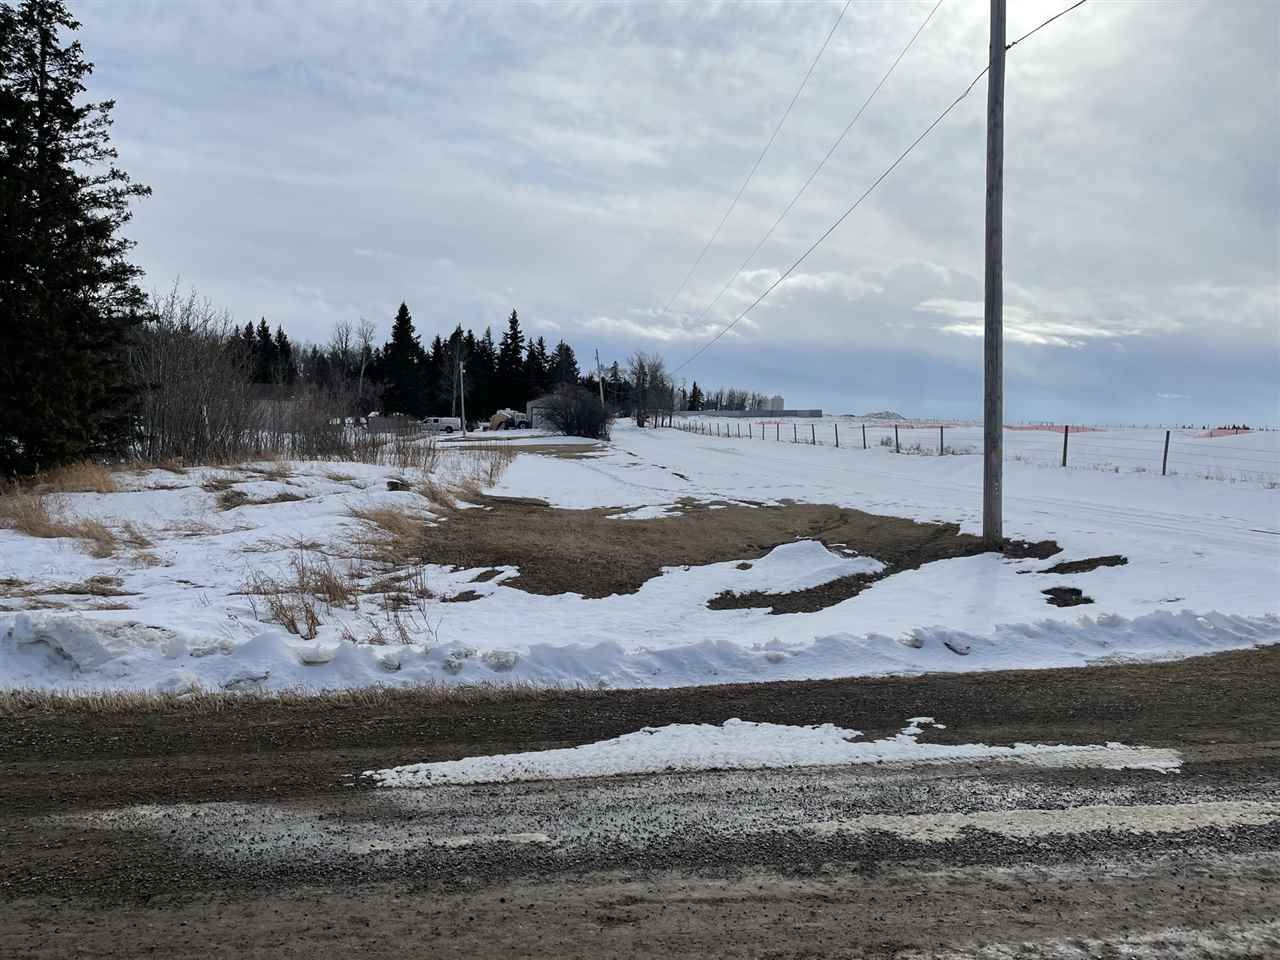 Main Photo: 6421 NORTH PINE Road in Fort St. John: Fort St. John - Rural W 100th Land for sale (Fort St. John (Zone 60))  : MLS®# R2535079